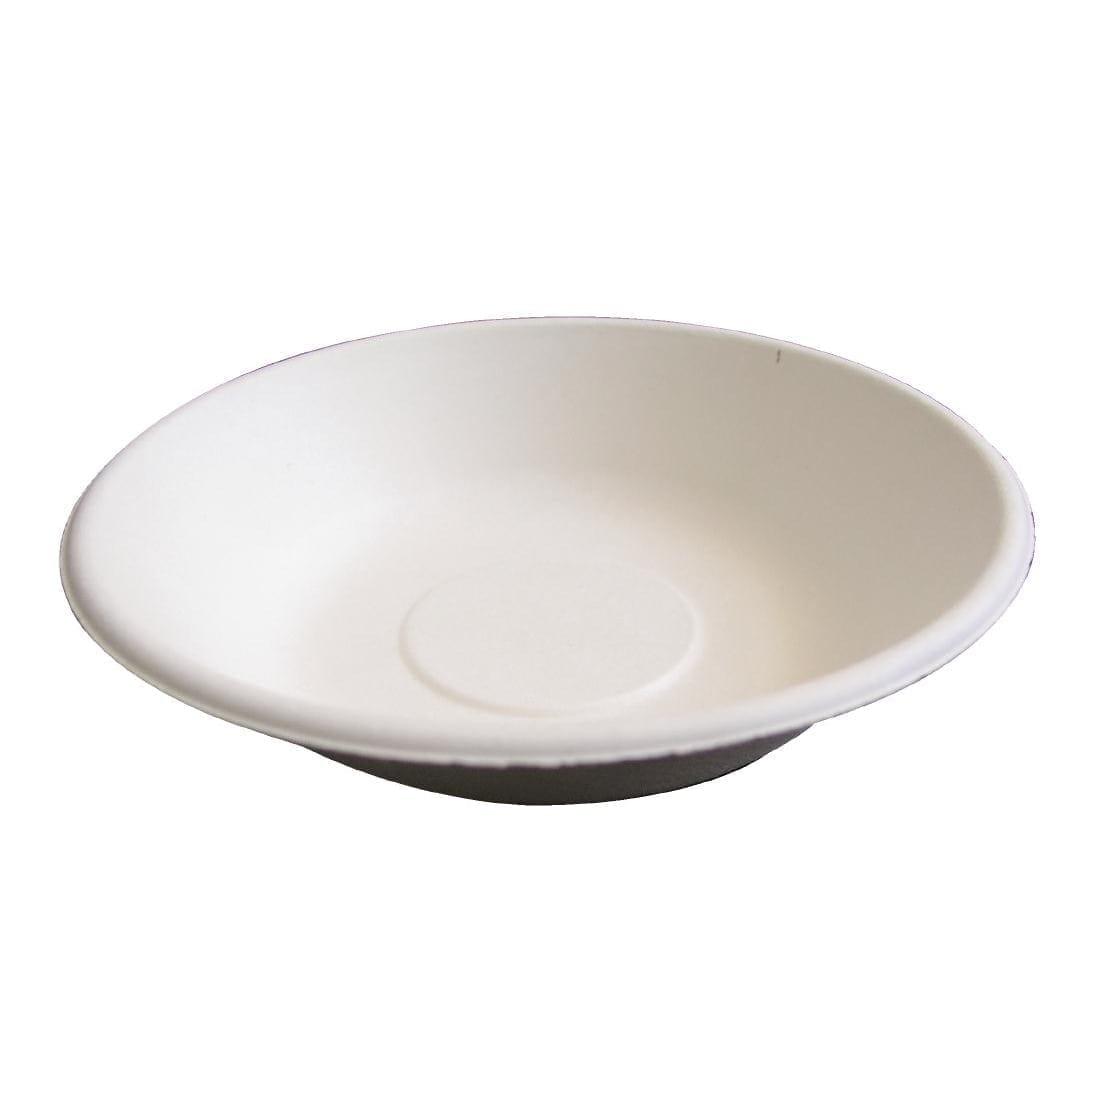 Biodegradable Bowl - 340ml 11.5oz (Pack 125)-0